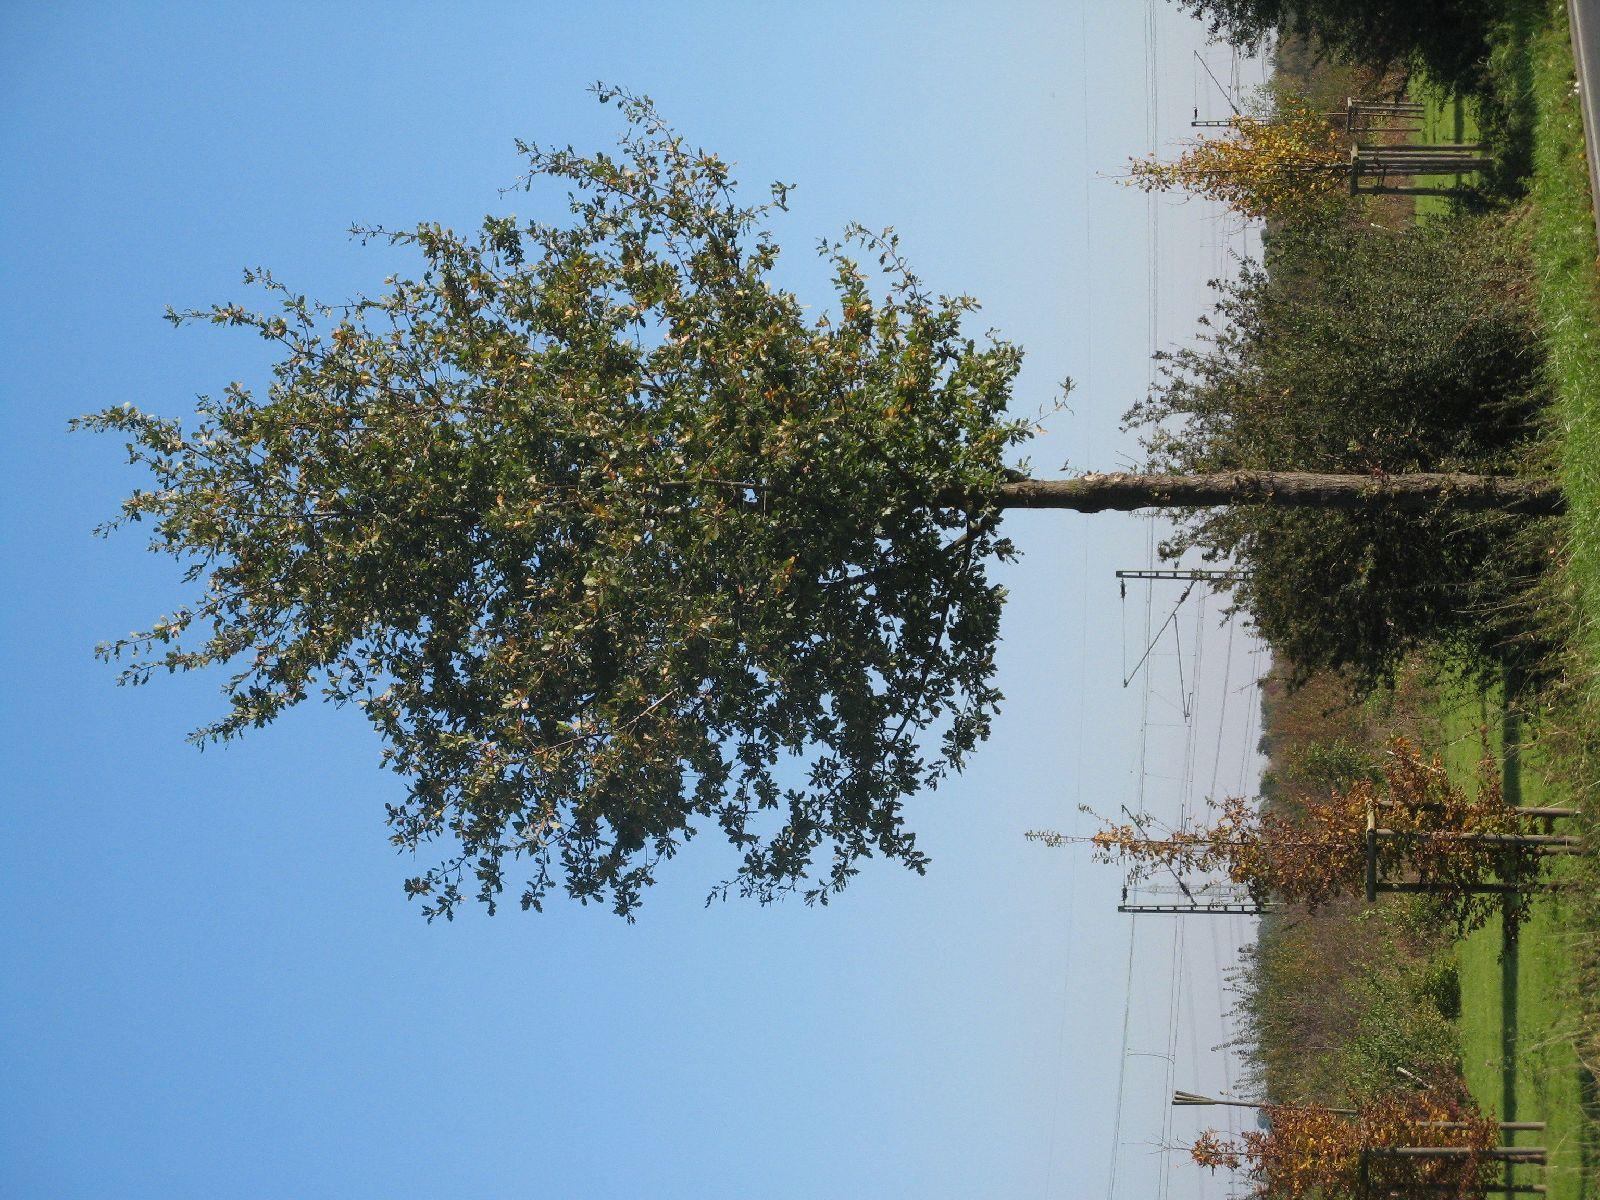 Plants-Trees_Photo_Texture_B_3734